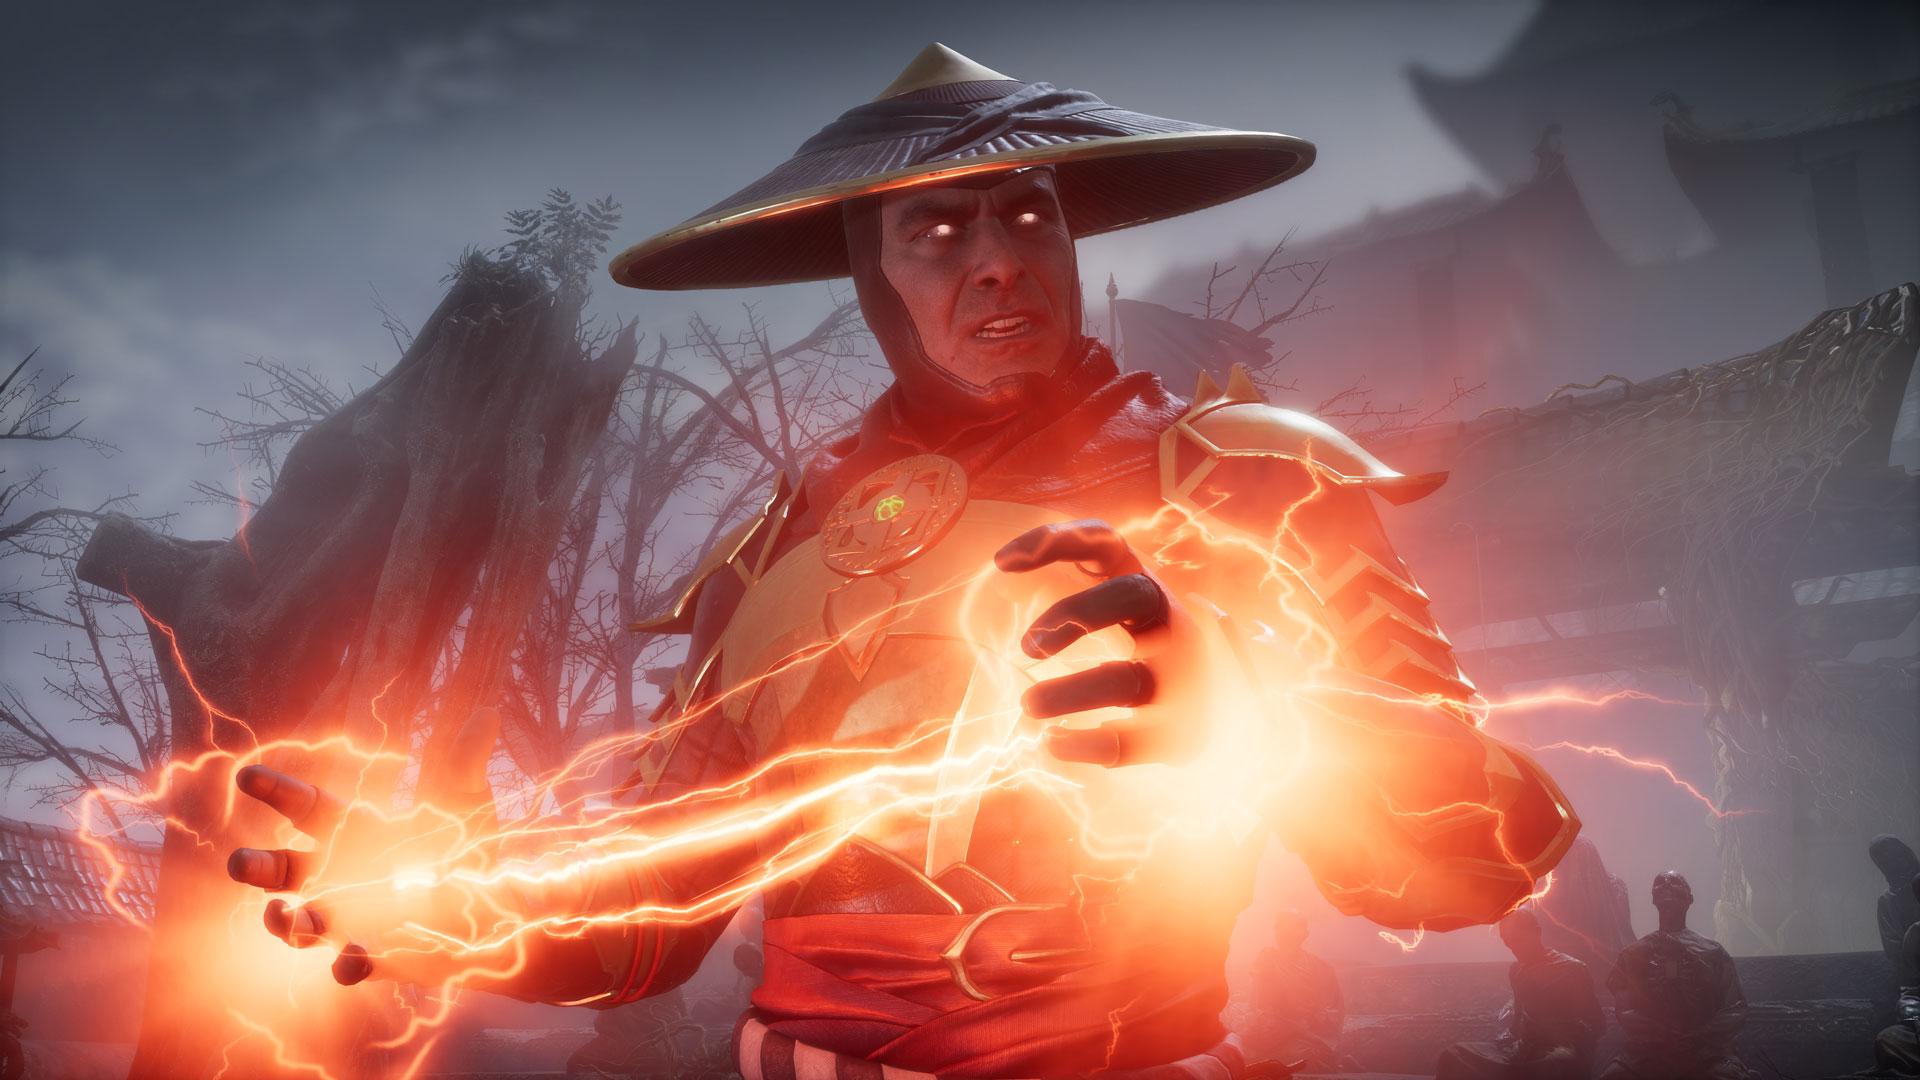 General 1920x1080 Mortal Kombat 11 video games Video Game Warriors